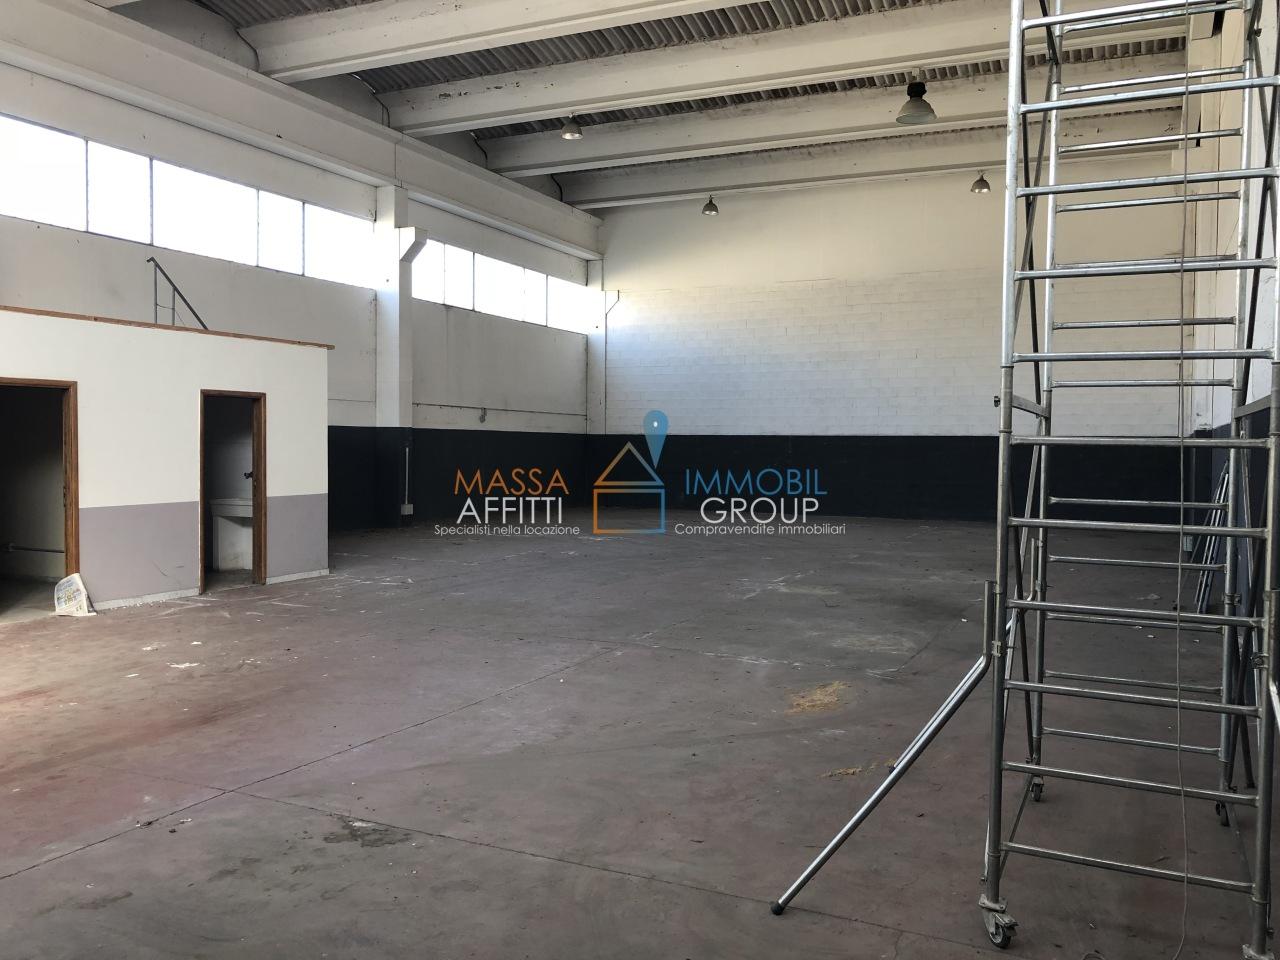 Capannone / Fondo - Industriale/Artigianale a Avenza, Carrara Rif. 8282592